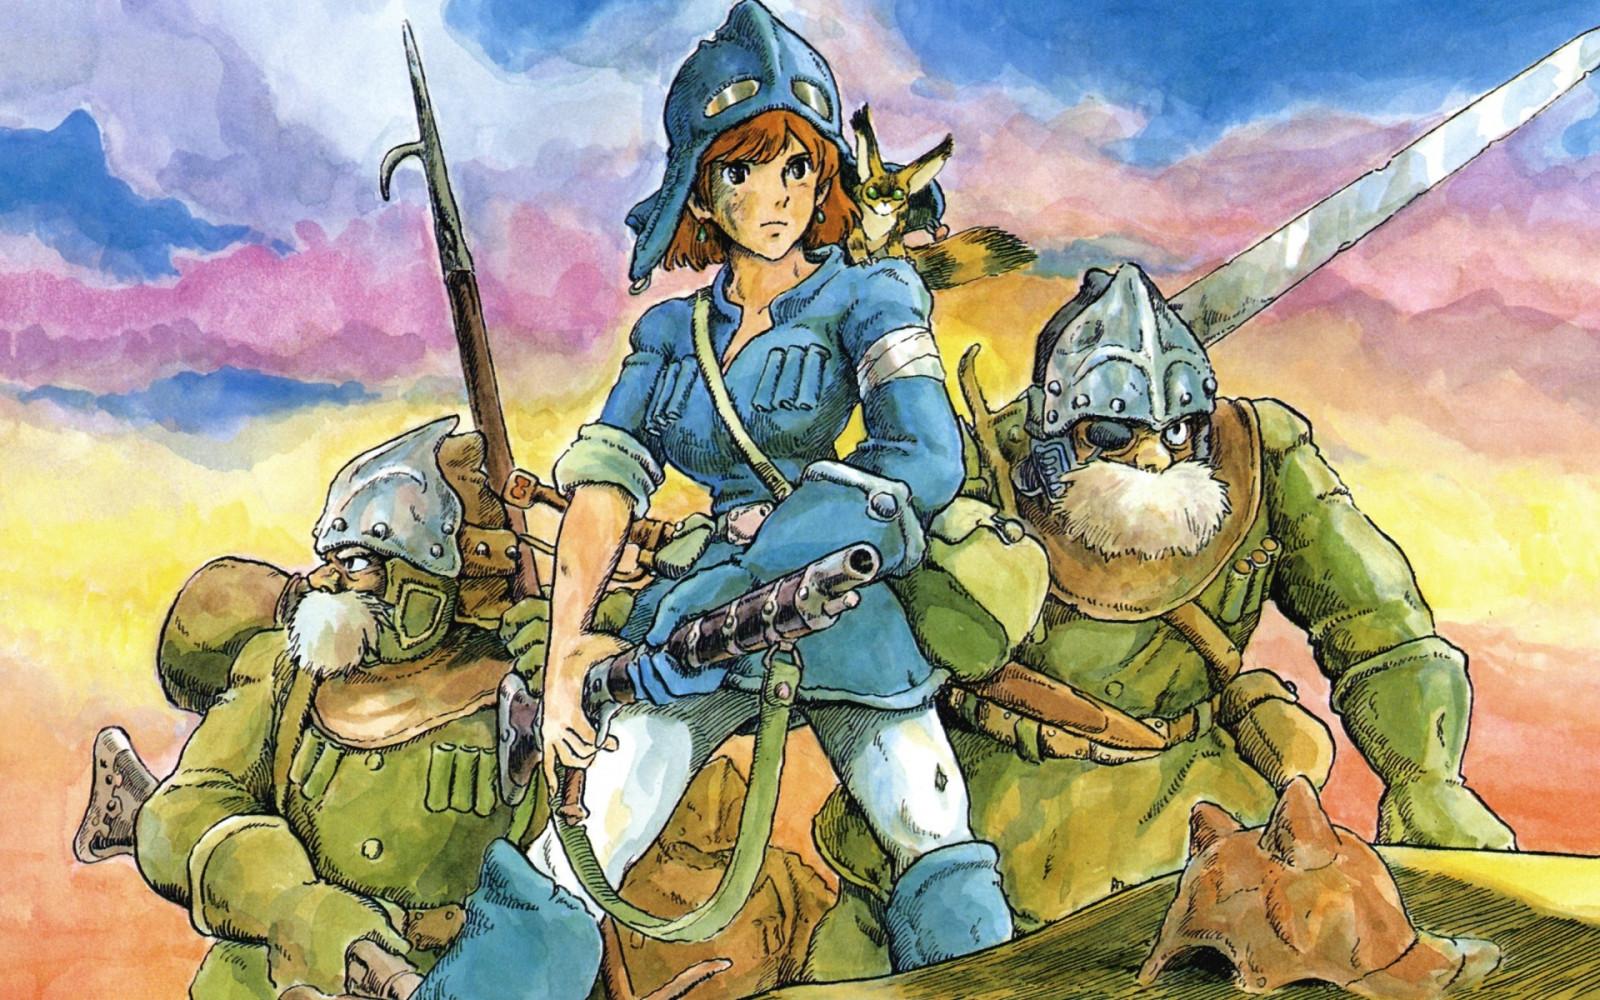 Wallpaper : painting, illustration, anime, Studio Ghibli ... |Nausicaa Studio Ghibli Wallpaper